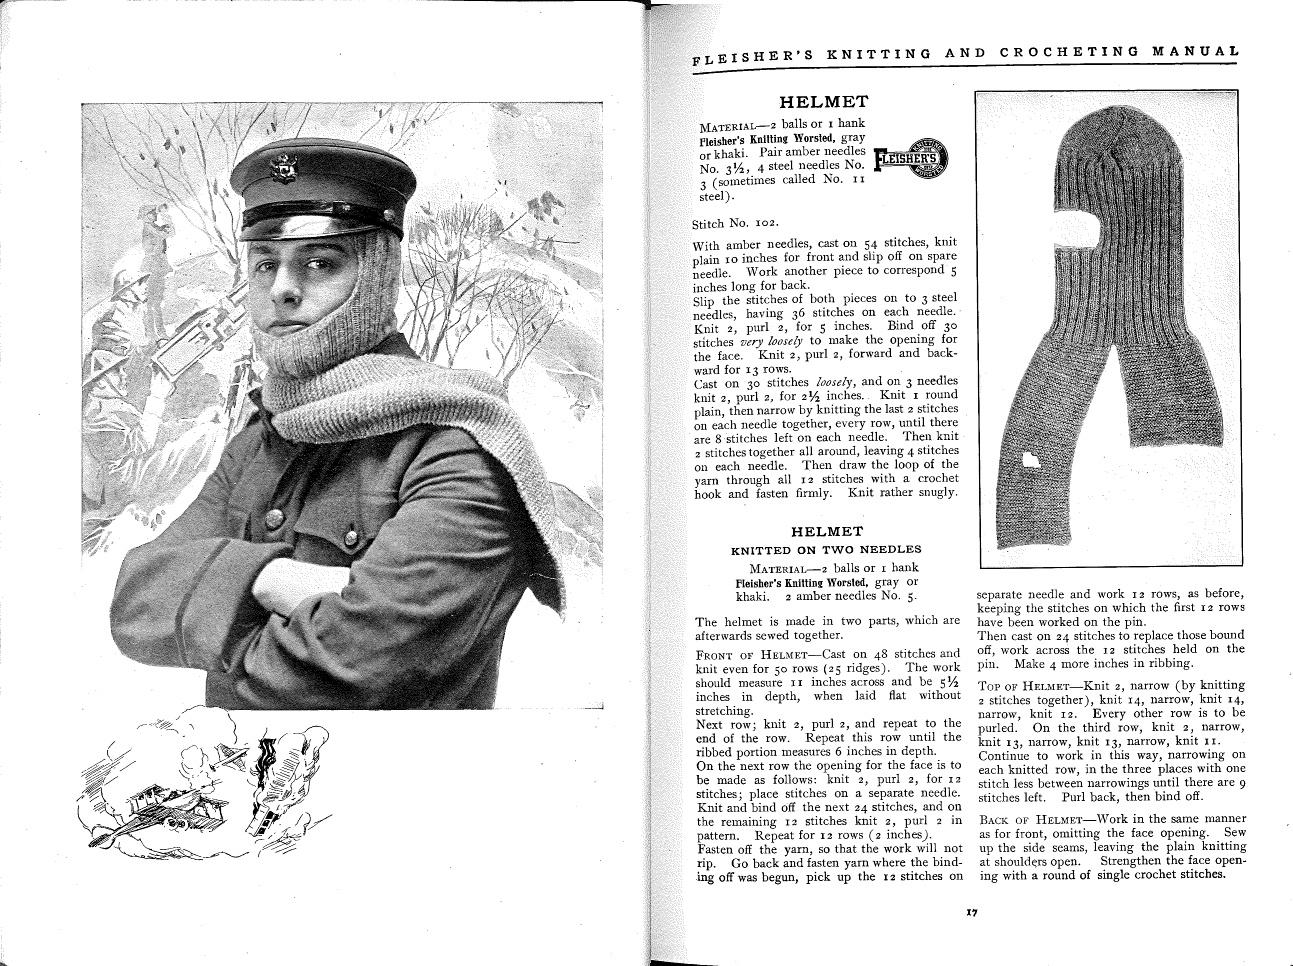 Helmet pattern from Fleisher's Knitting & Crocheting Manual, 1918